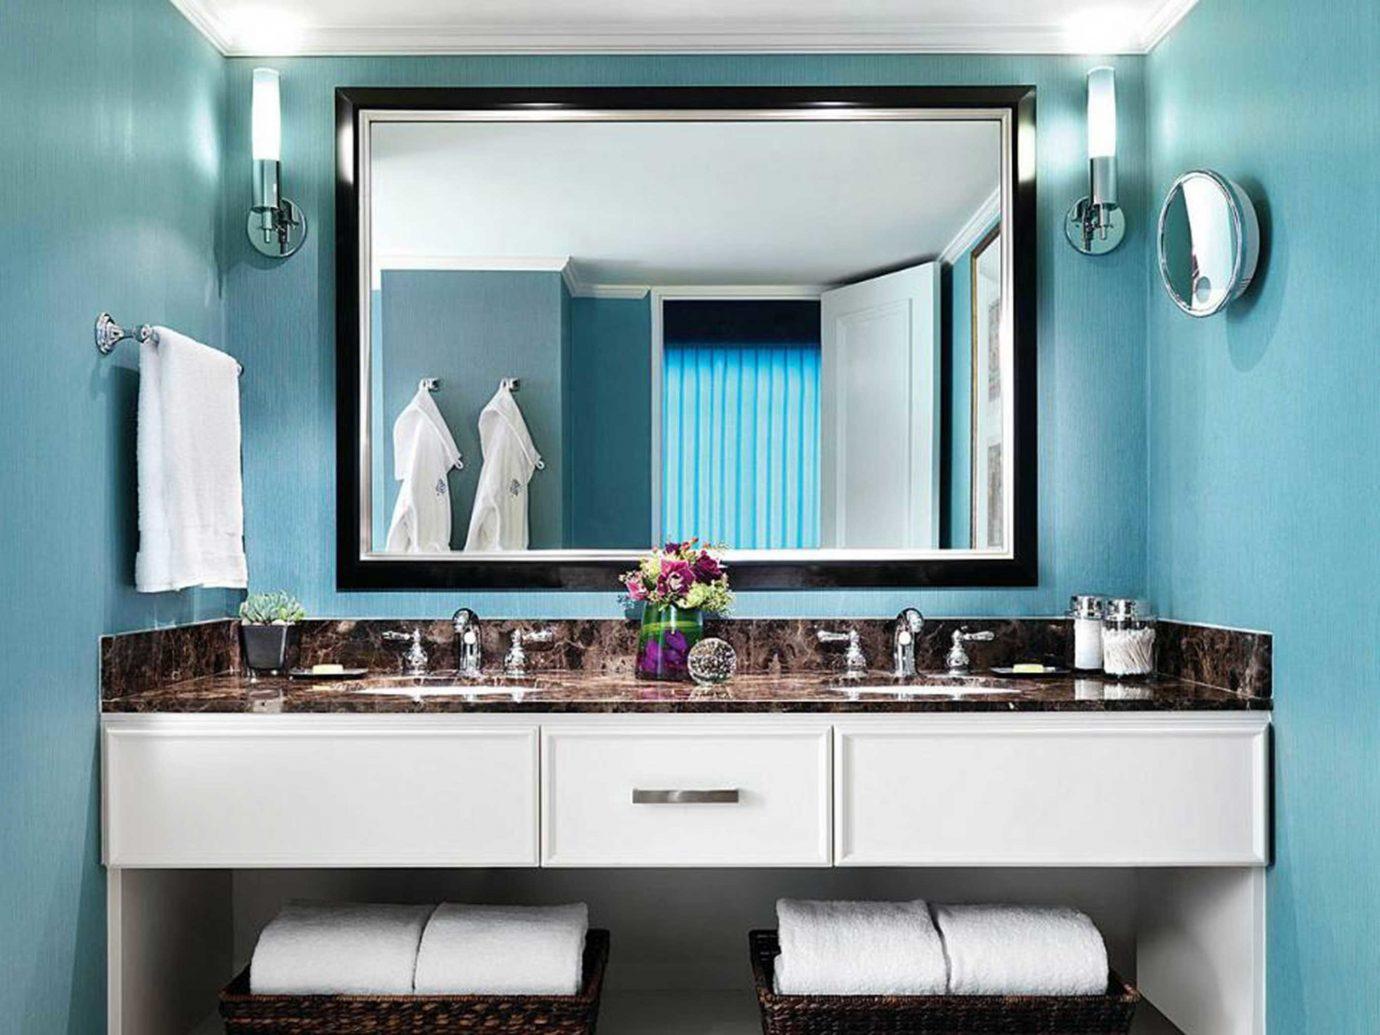 Bath Classic Hotels Living Luxury Resort indoor bathroom wall room mirror property sink Kitchen home cabinetry interior design estate Design living room